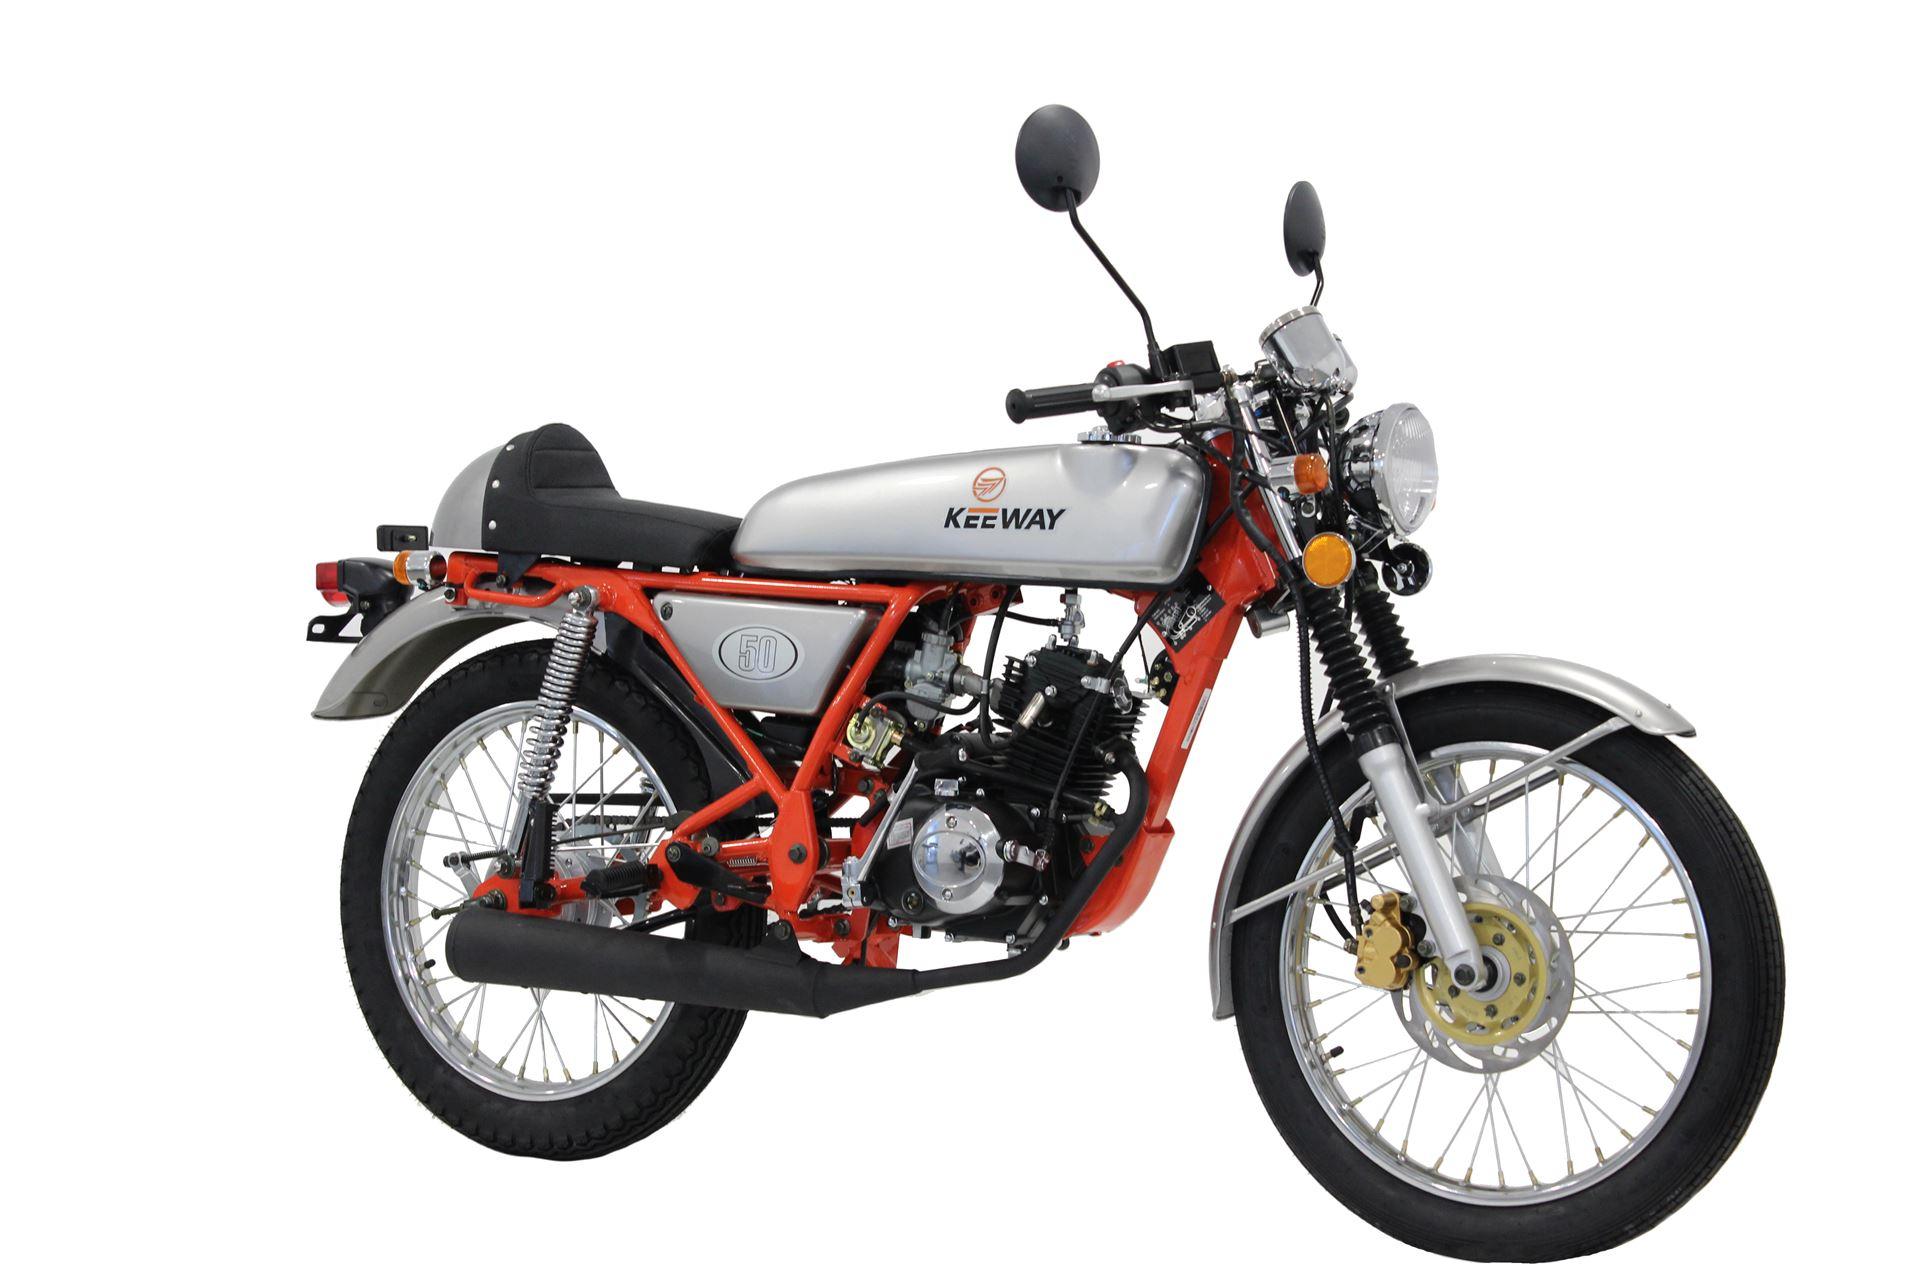 keeway ace 50 moto moto 50 andar de moto. Black Bedroom Furniture Sets. Home Design Ideas